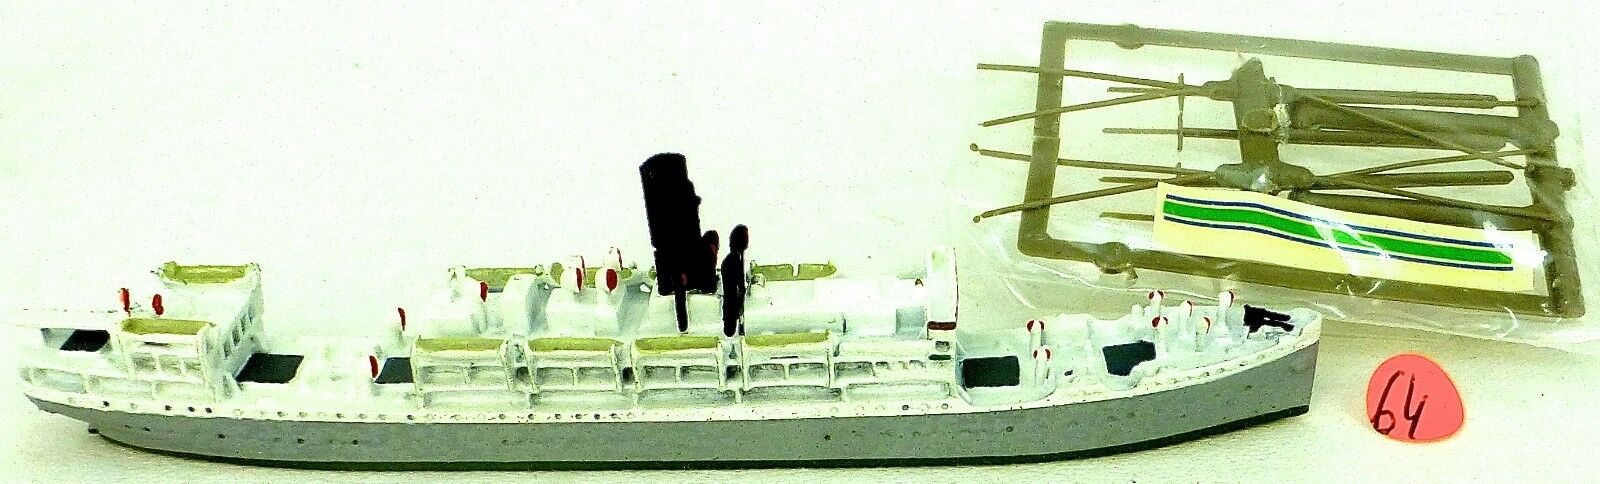 tienda de bajo costo Prof. Woermann m412 barco modelo 1 1250    64 Å   comprar nuevo barato